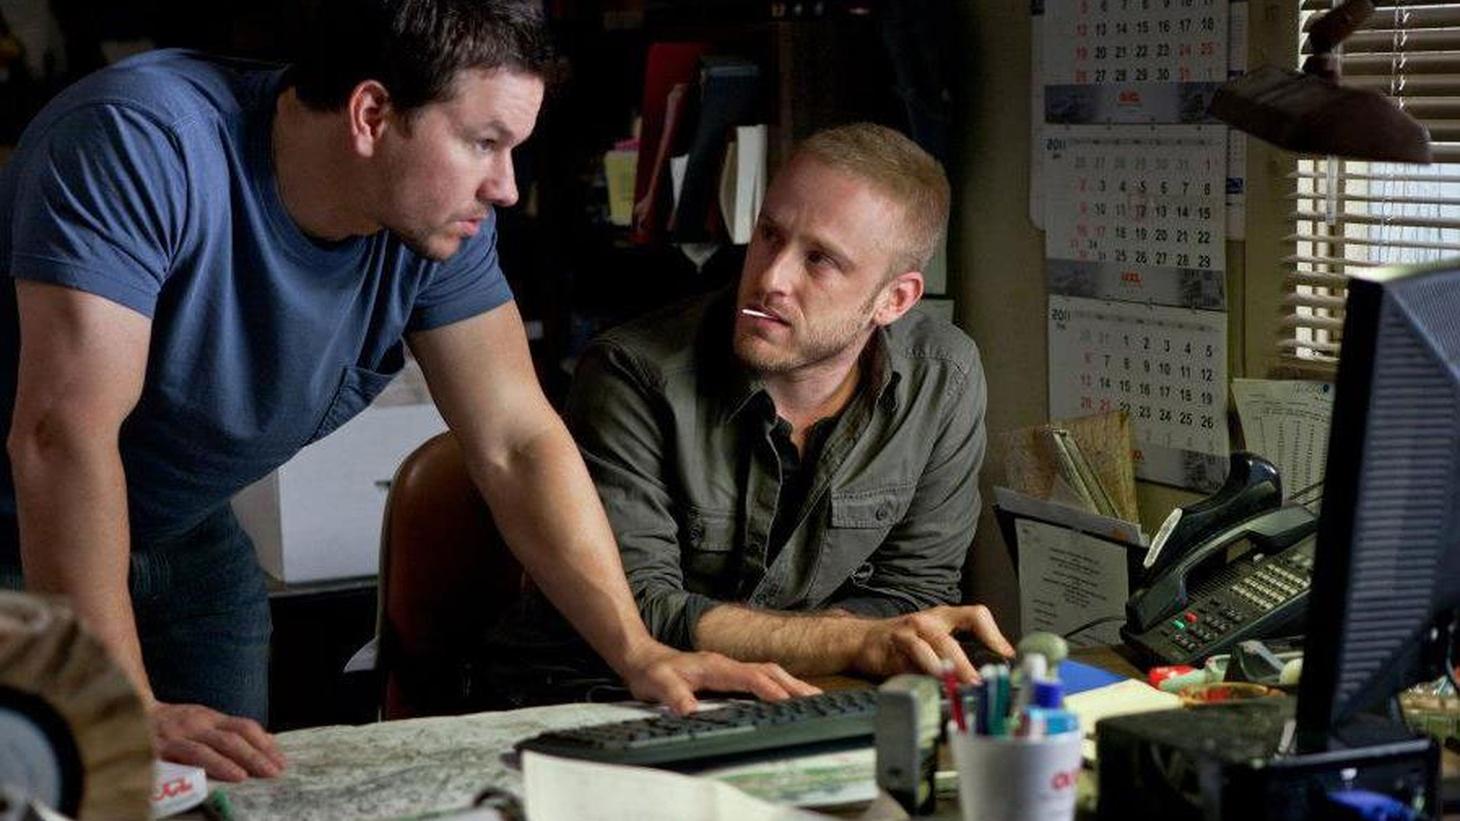 Joe Morgenstern reviews Contraband, a breakneck English-language remake of the Icelandic thriller, Reykjavkik-Rotterdam.